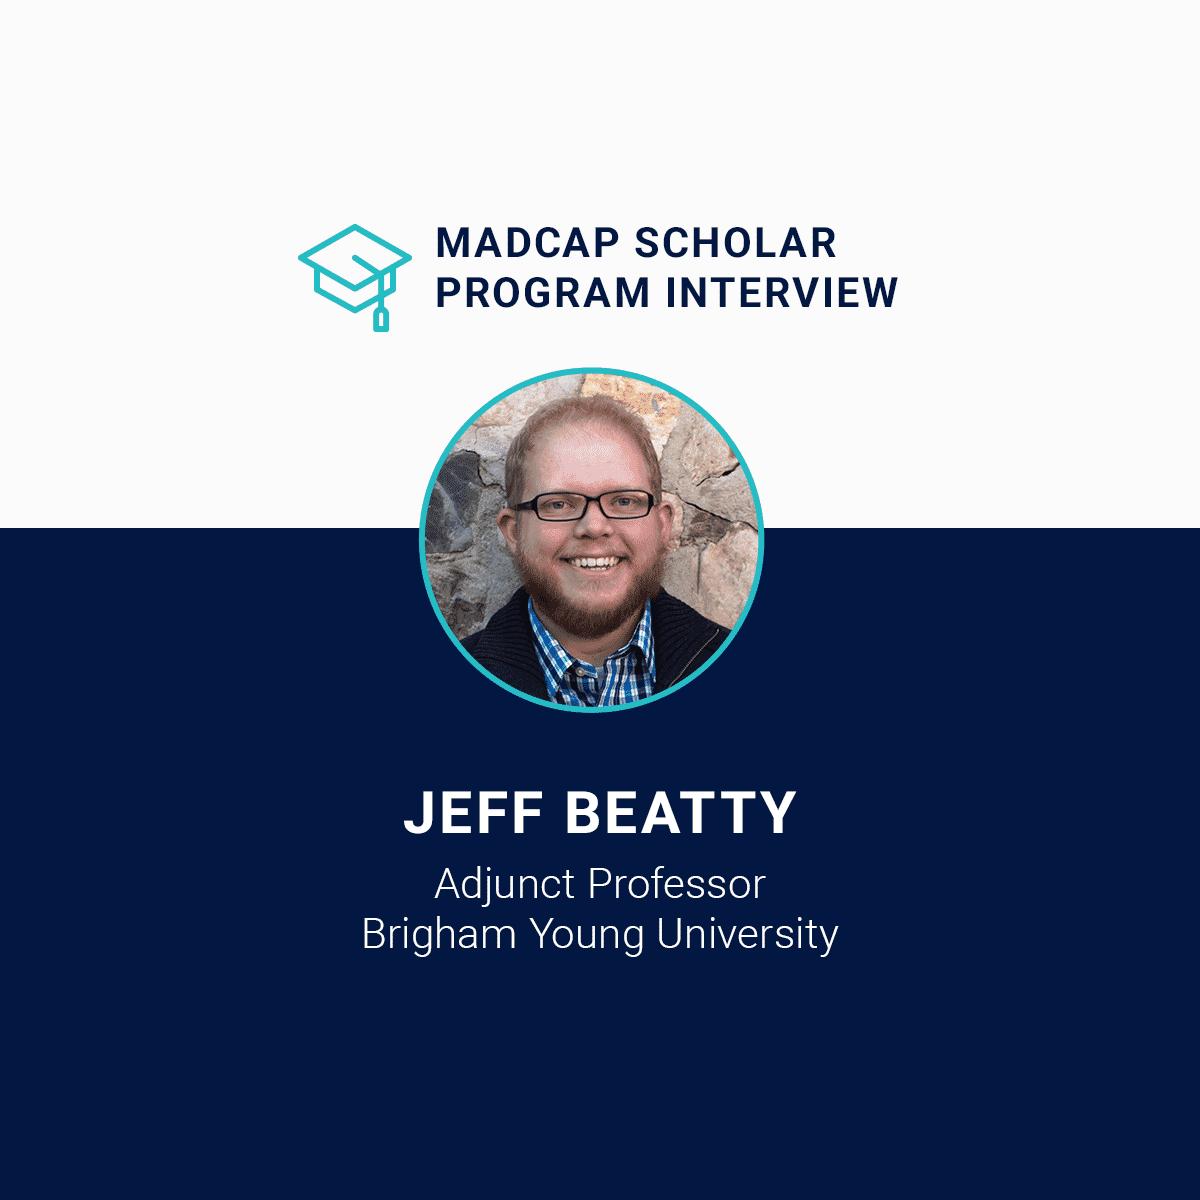 MadCap Scholar Program Interview Jeff Beatty